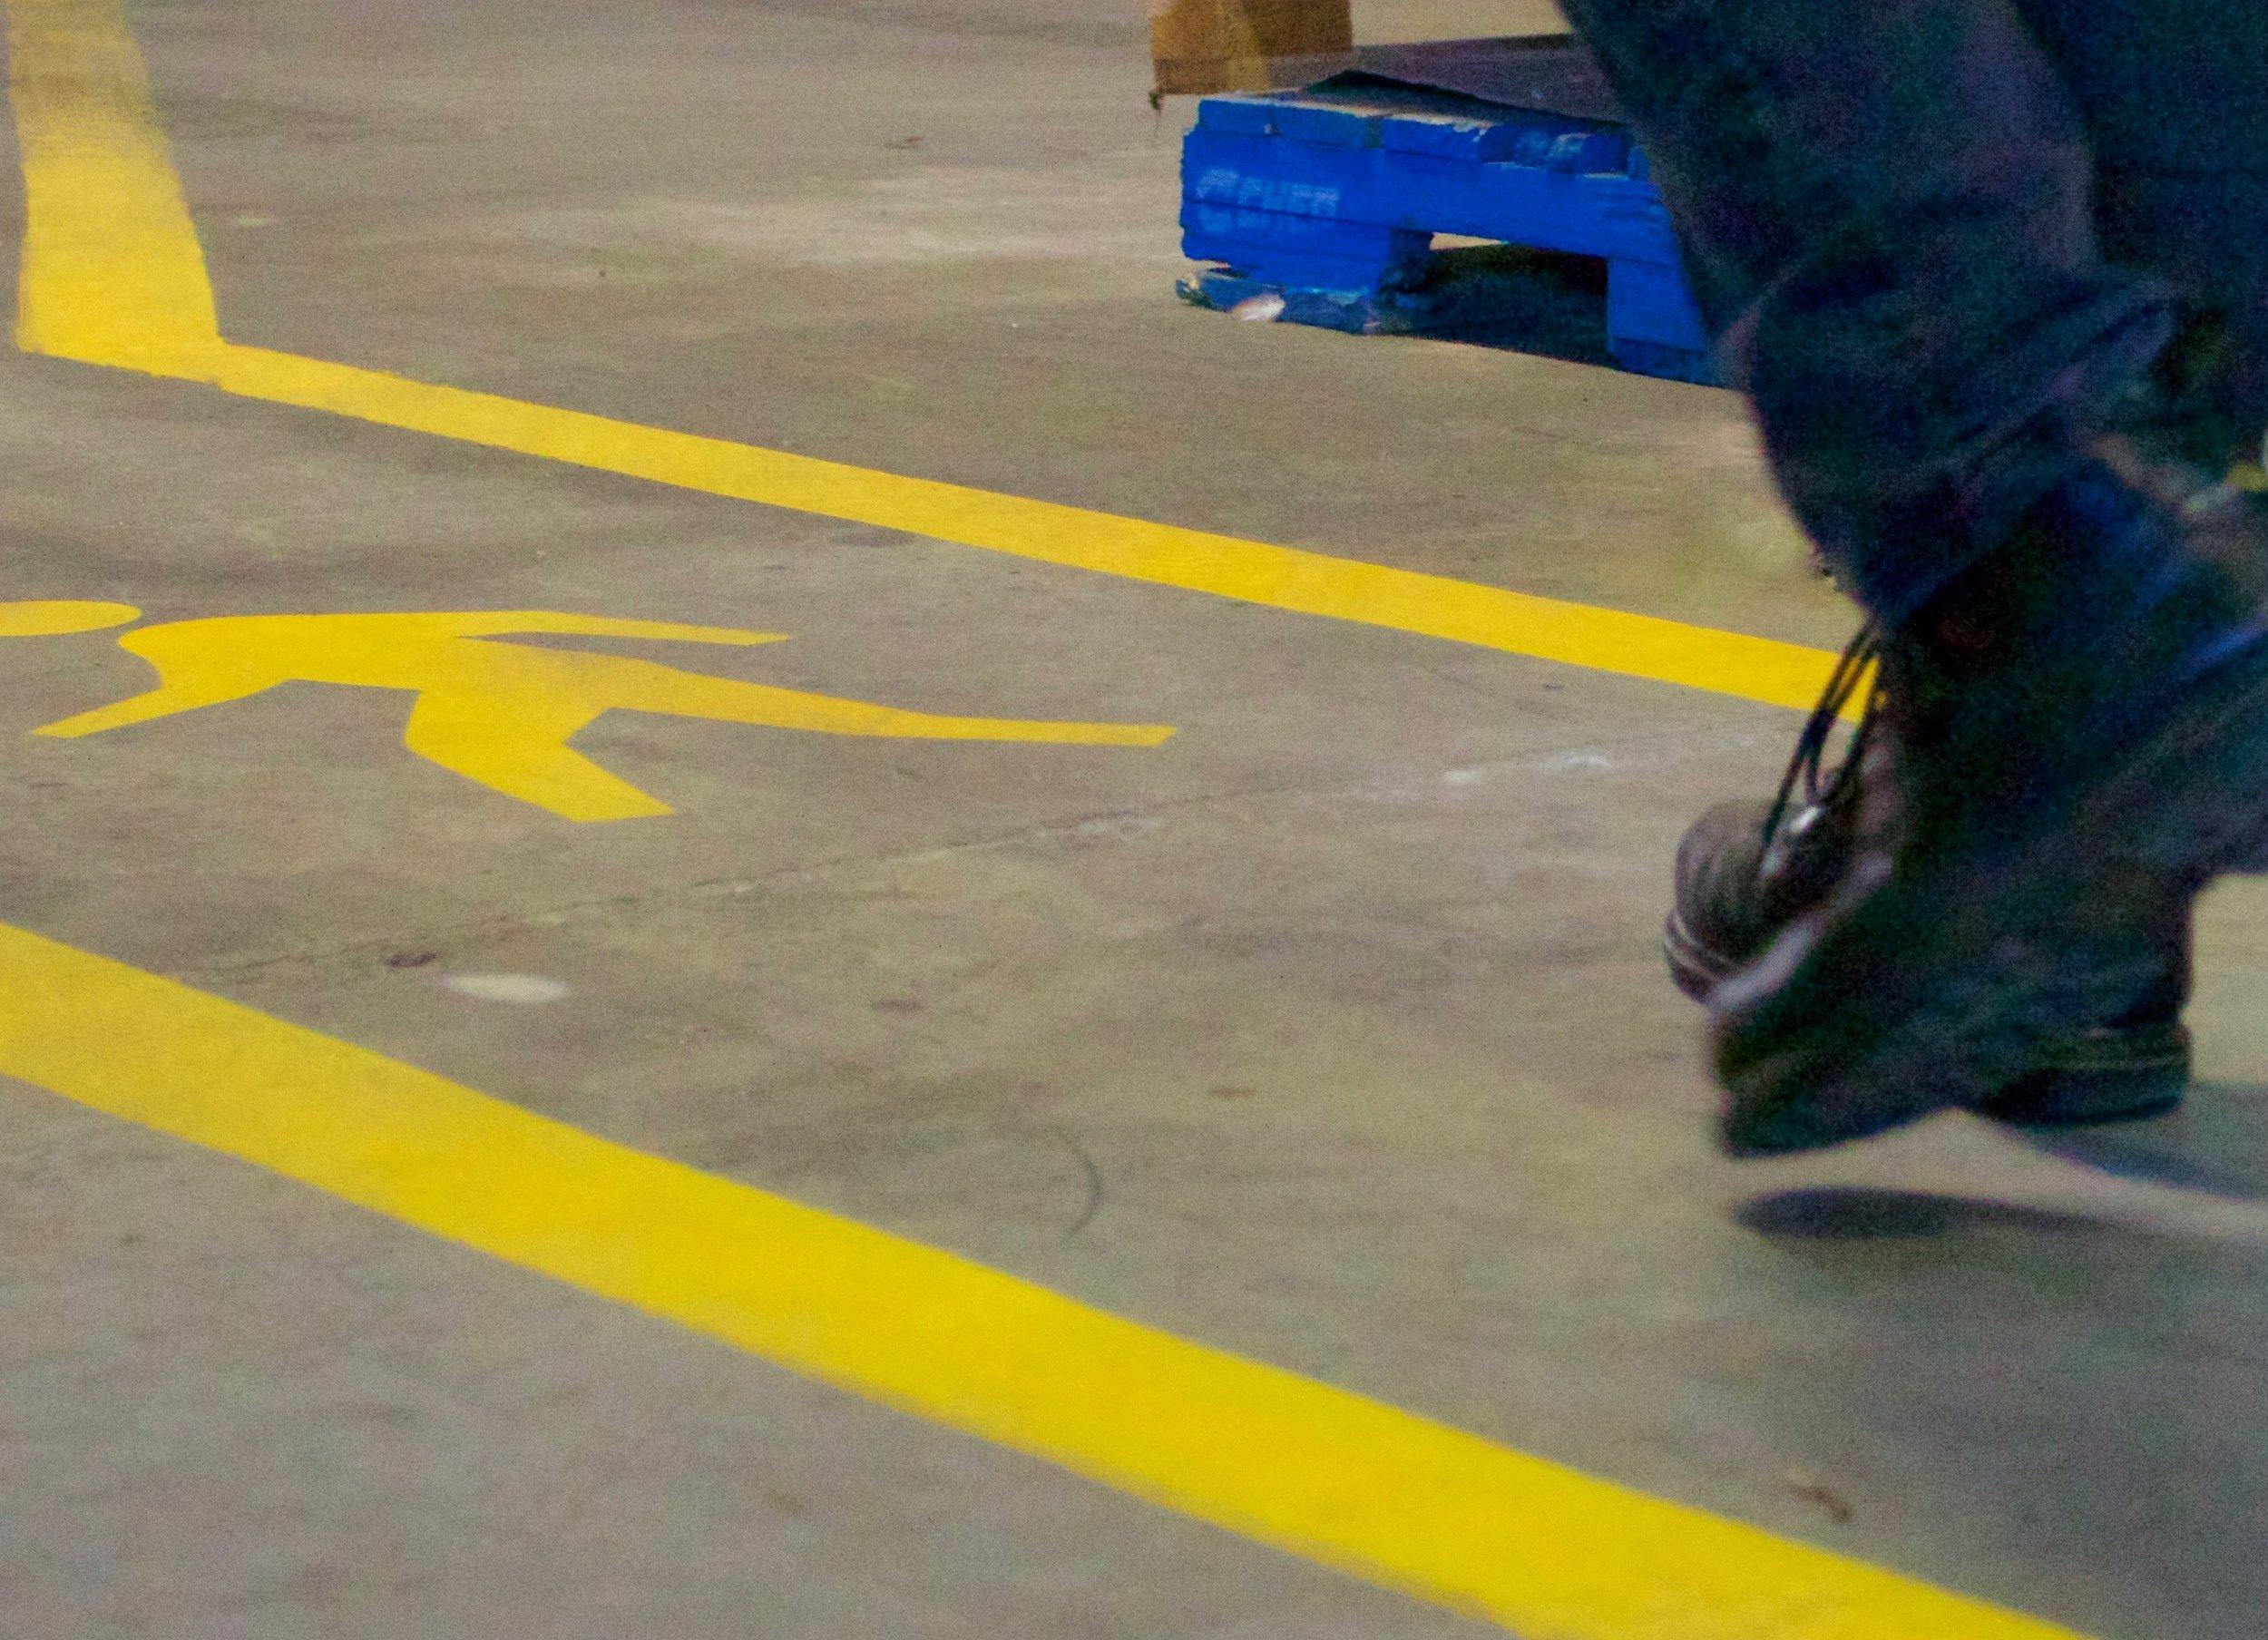 Warehouse marking